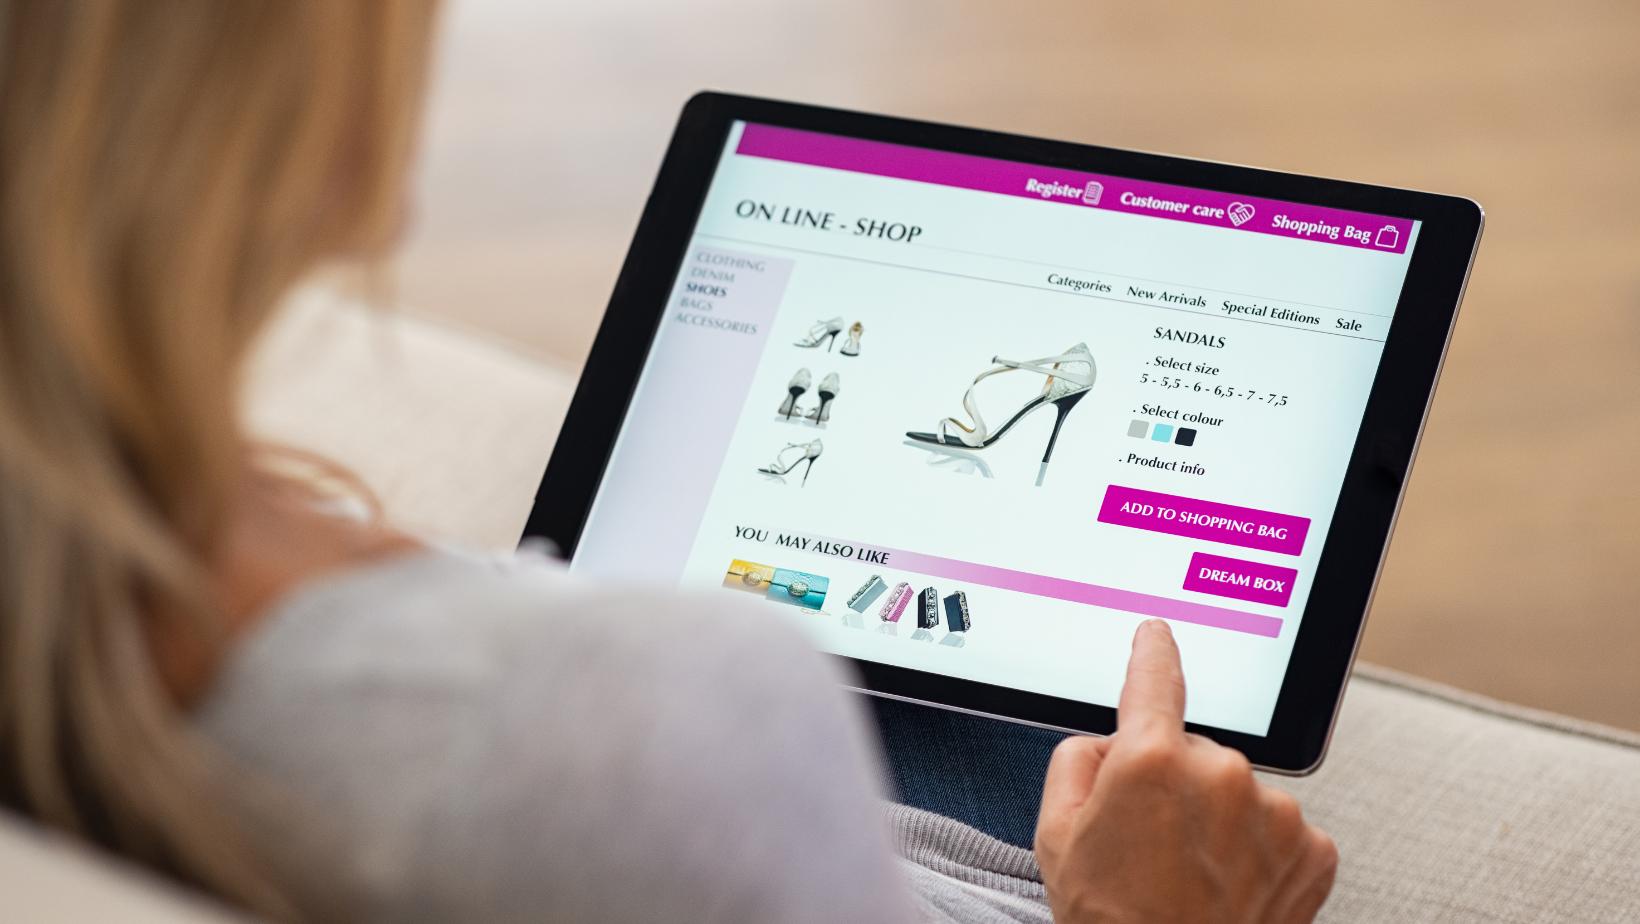 regulamin sklepu internetowego ustawa o prawach konsumenta